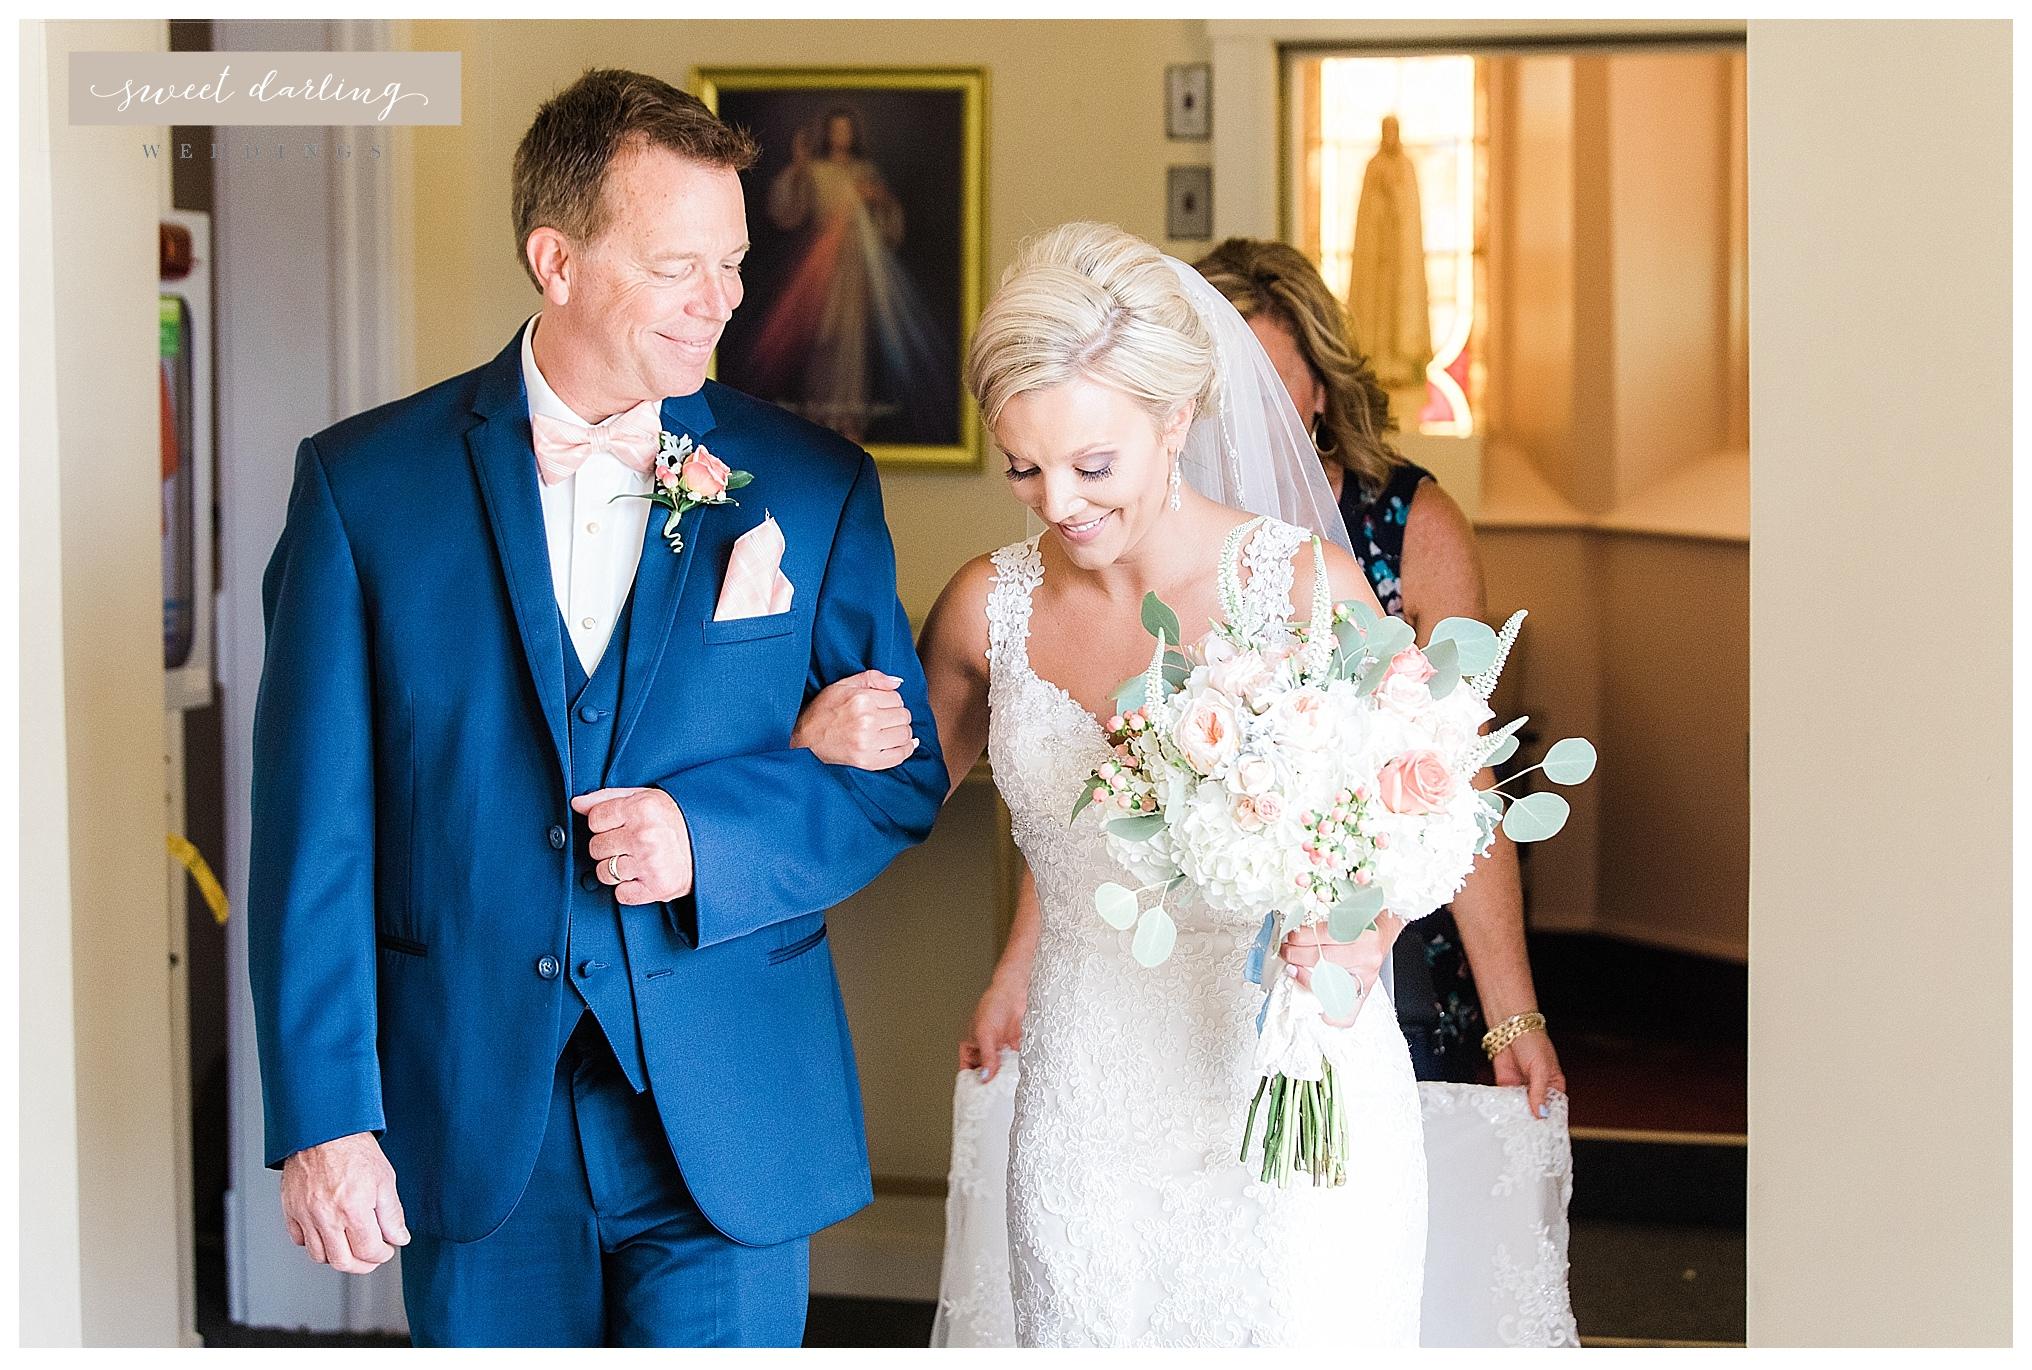 Paxton-illinois-engelbrecht-farmstead-romantic-wedding-photographer-sweet-darling-weddings_1221.jpg